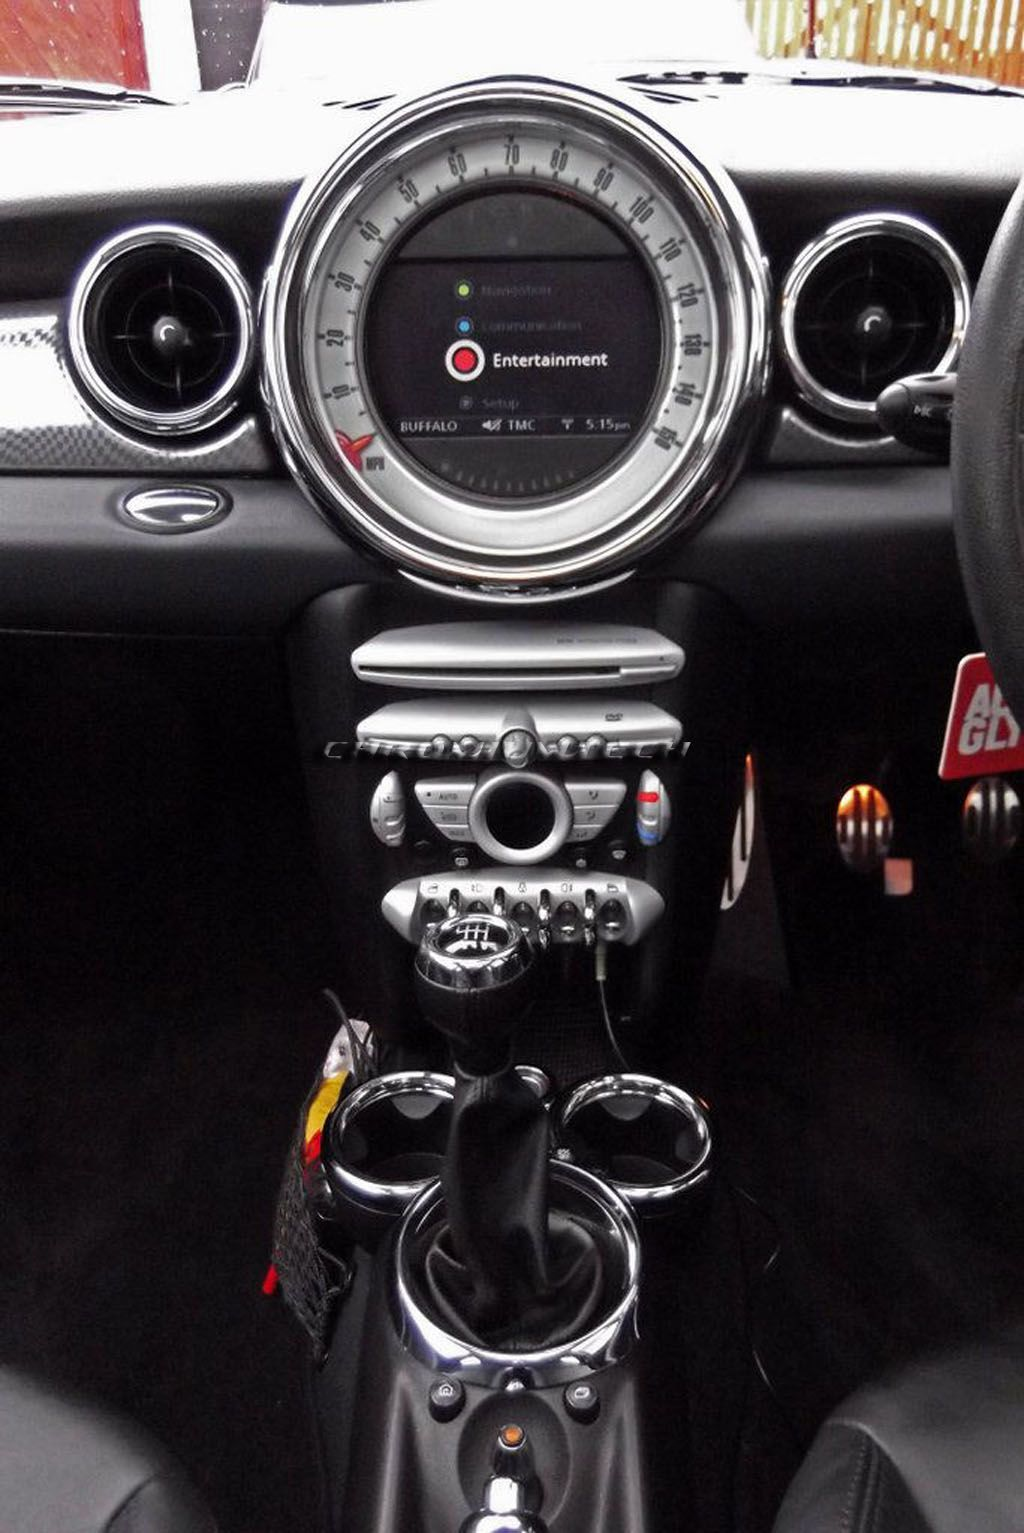 07+ MINI Cooper/ONE/S (R55, R56, R57) Chrome Dashboard